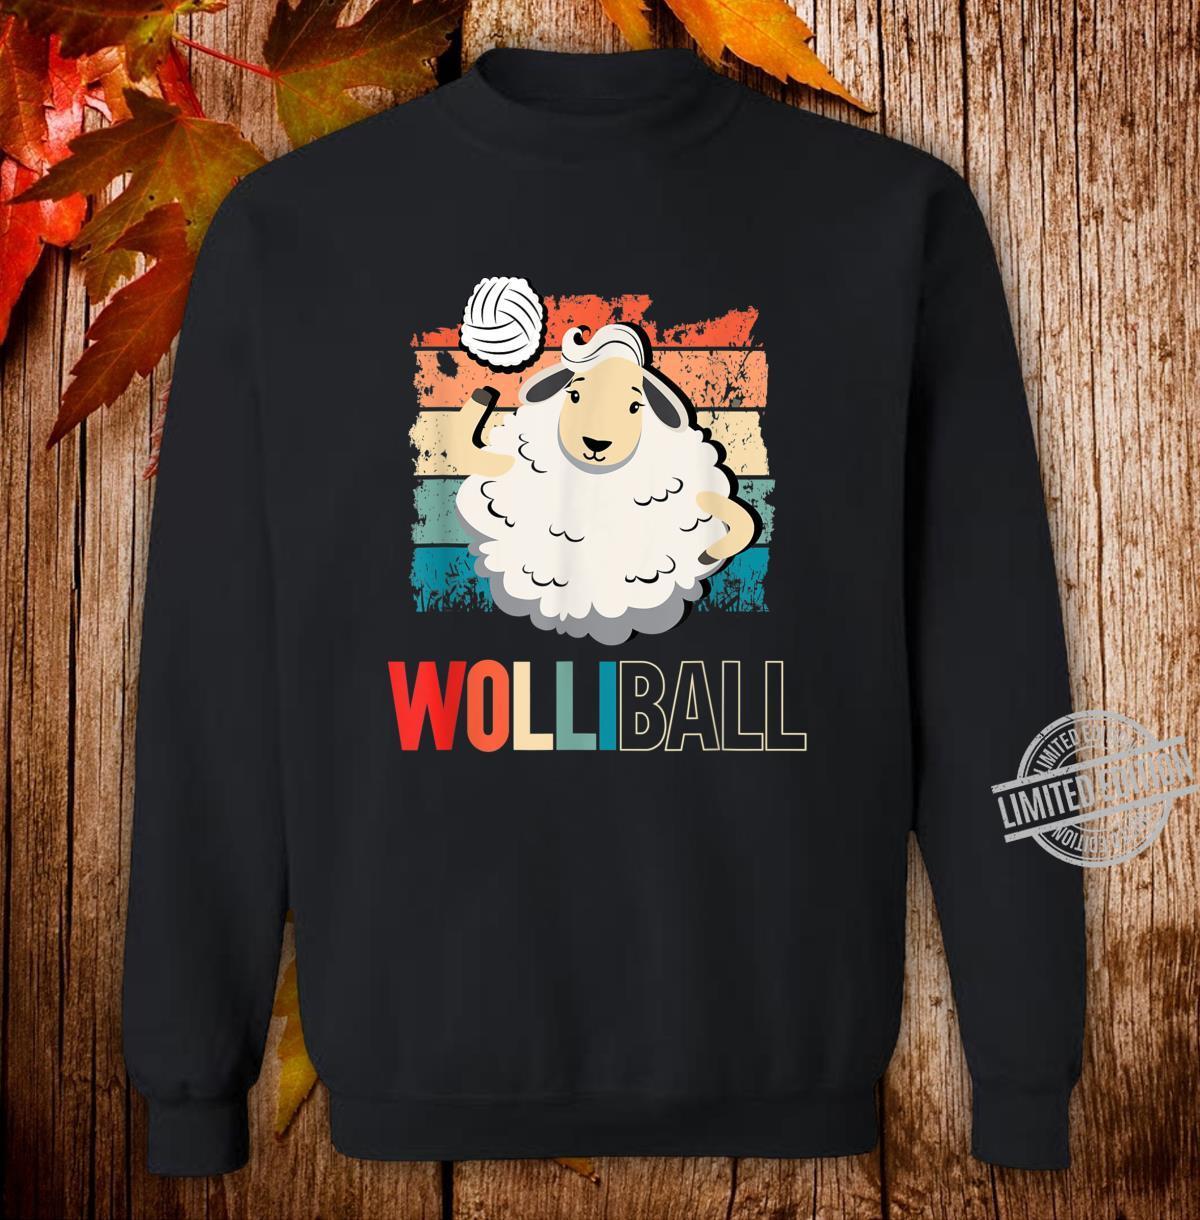 Wolliball Yolleyball Schaf Retro Spruch Motiv Shirt sweater